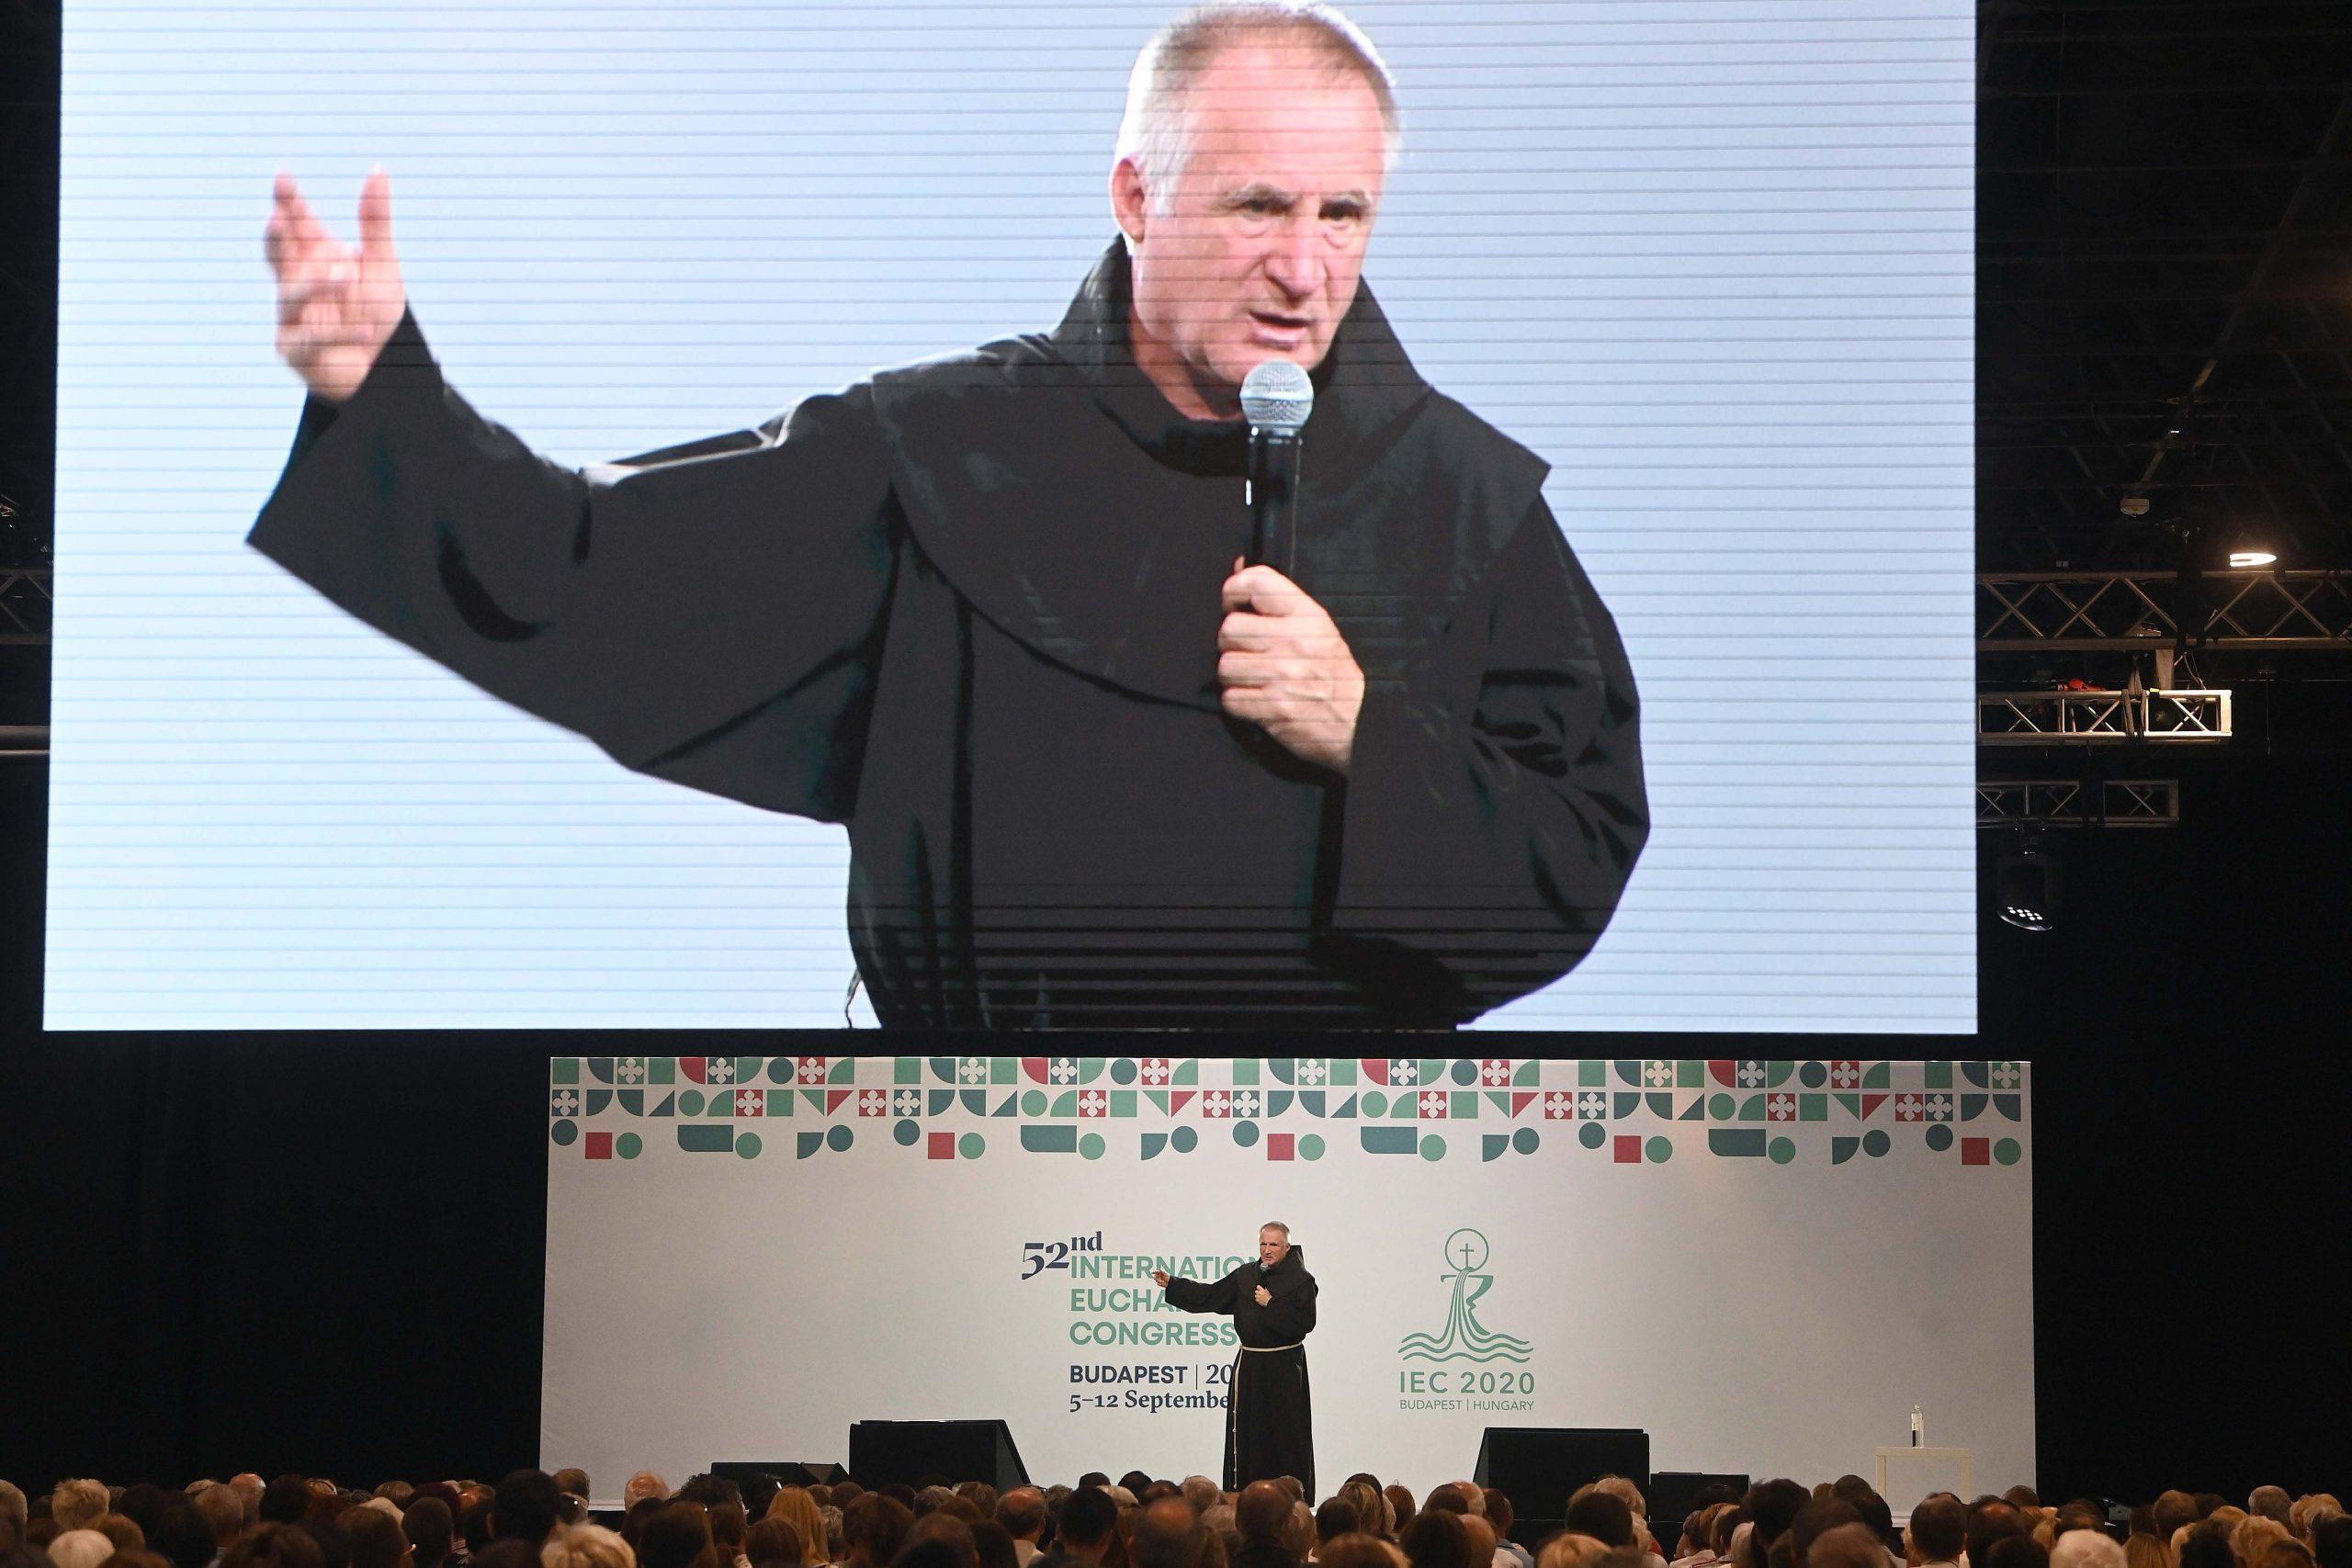 Franziskanermönch Csaba Böjte: